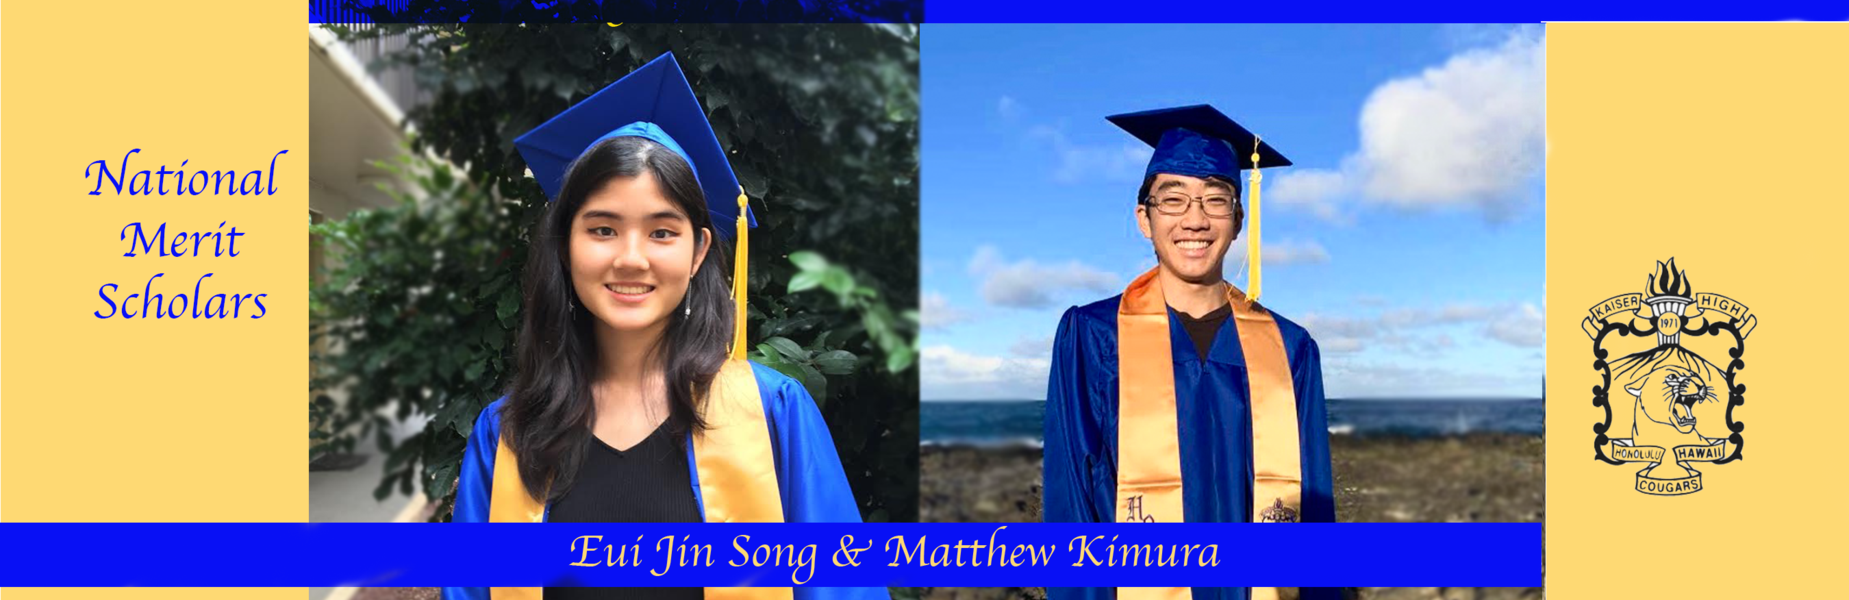 National Merit Scholars students